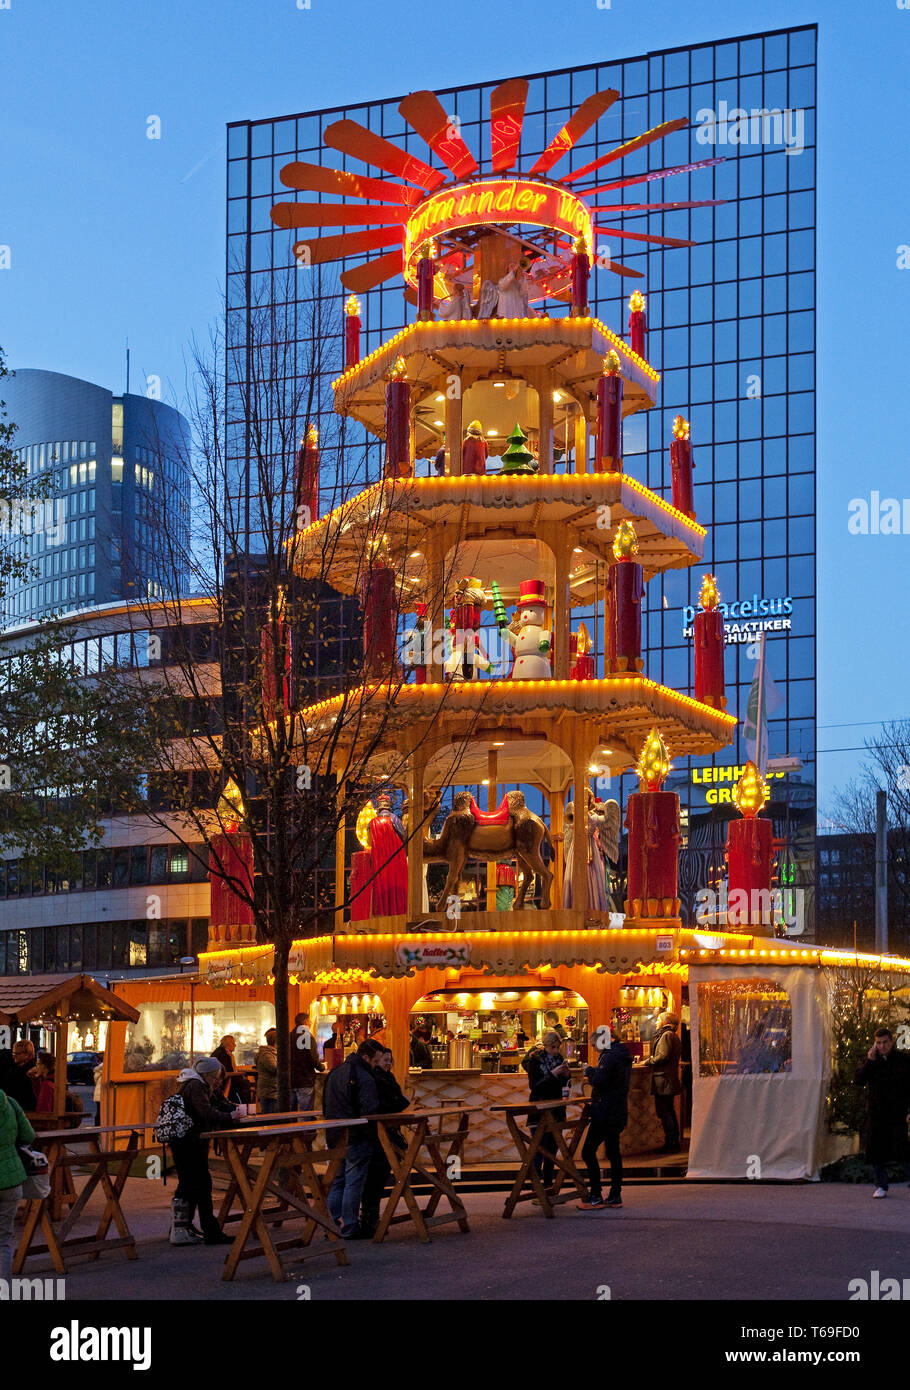 Christmas market, Dortmund, Ruhr area, North Rhine-Westphalia, Germany - Stock Image